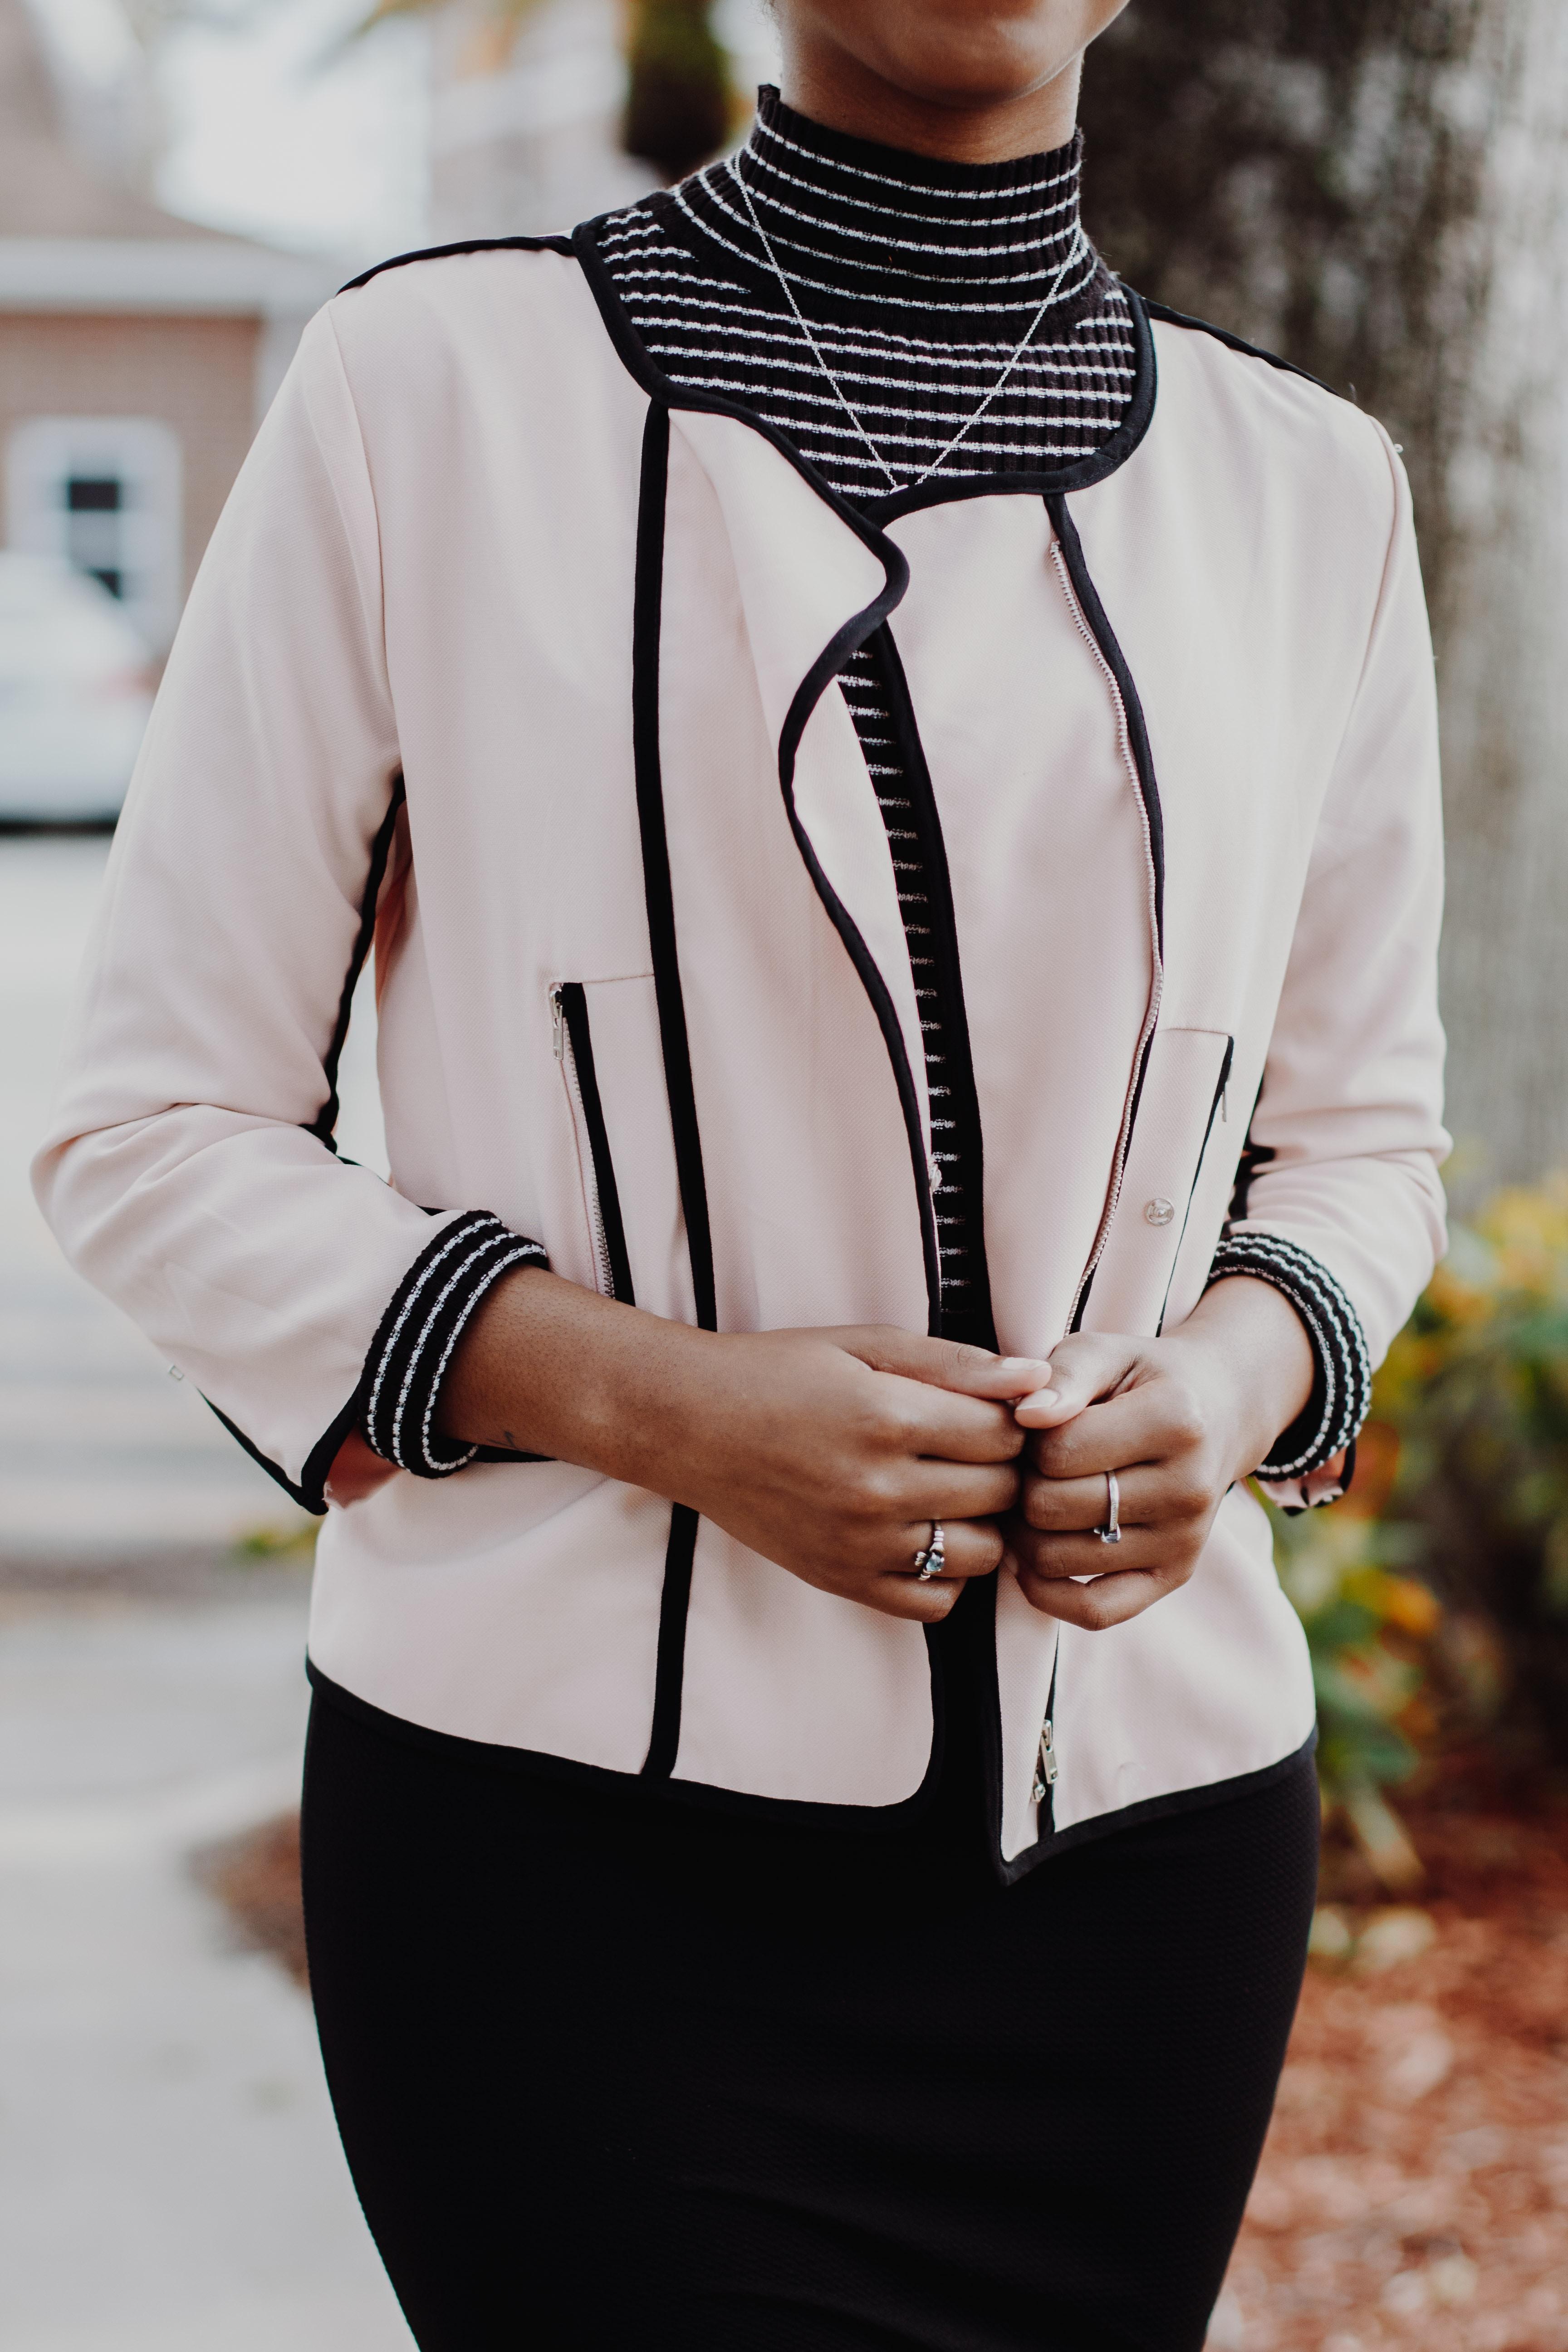 women's white and black blazer